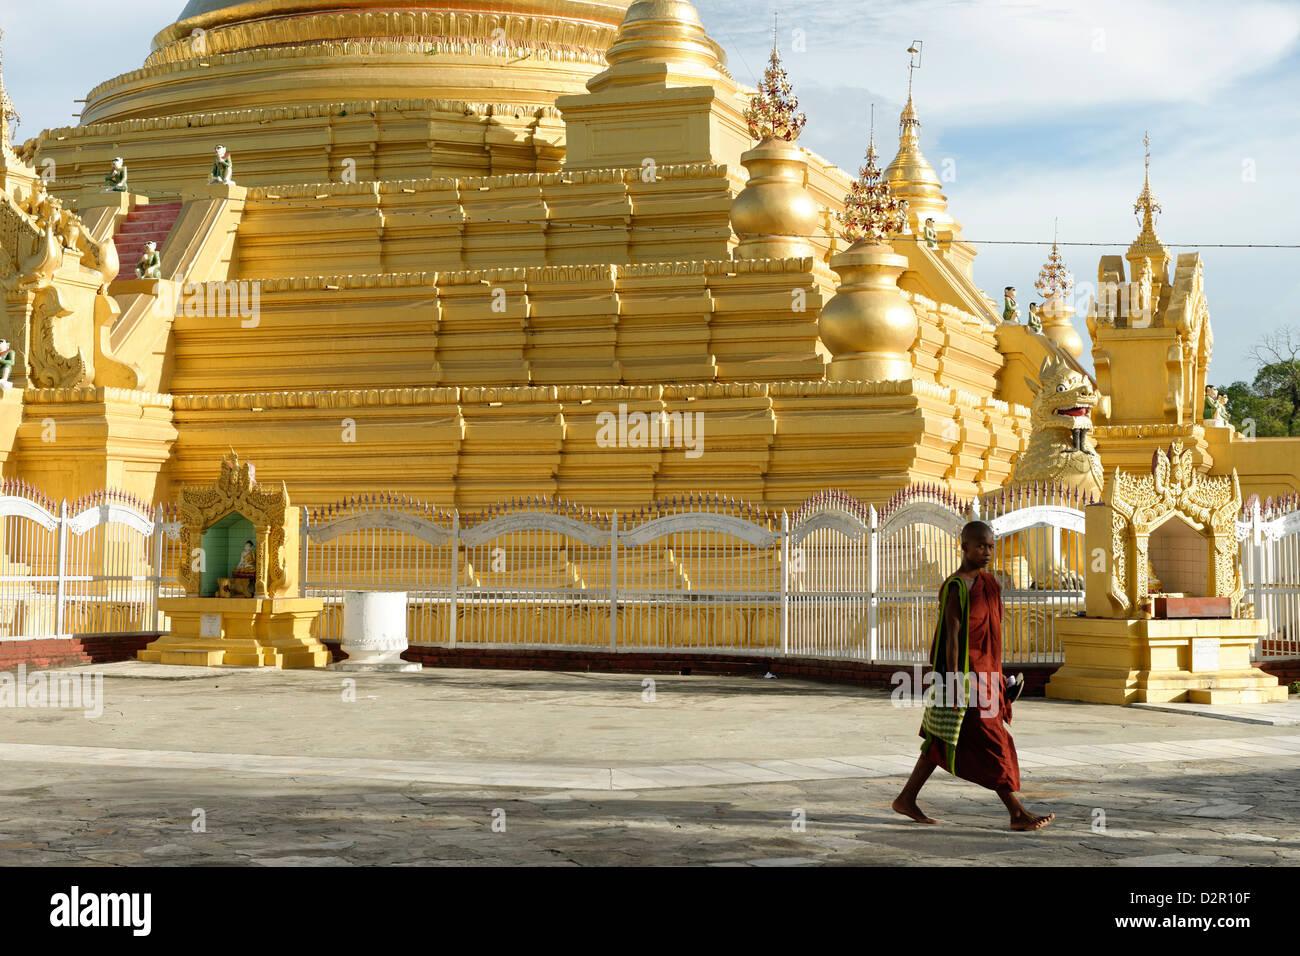 The Kuthodaw Pagoda, Mandalay city, Mandalay Division, Republic of the Union of Myanmar (Burma), Asia - Stock Image